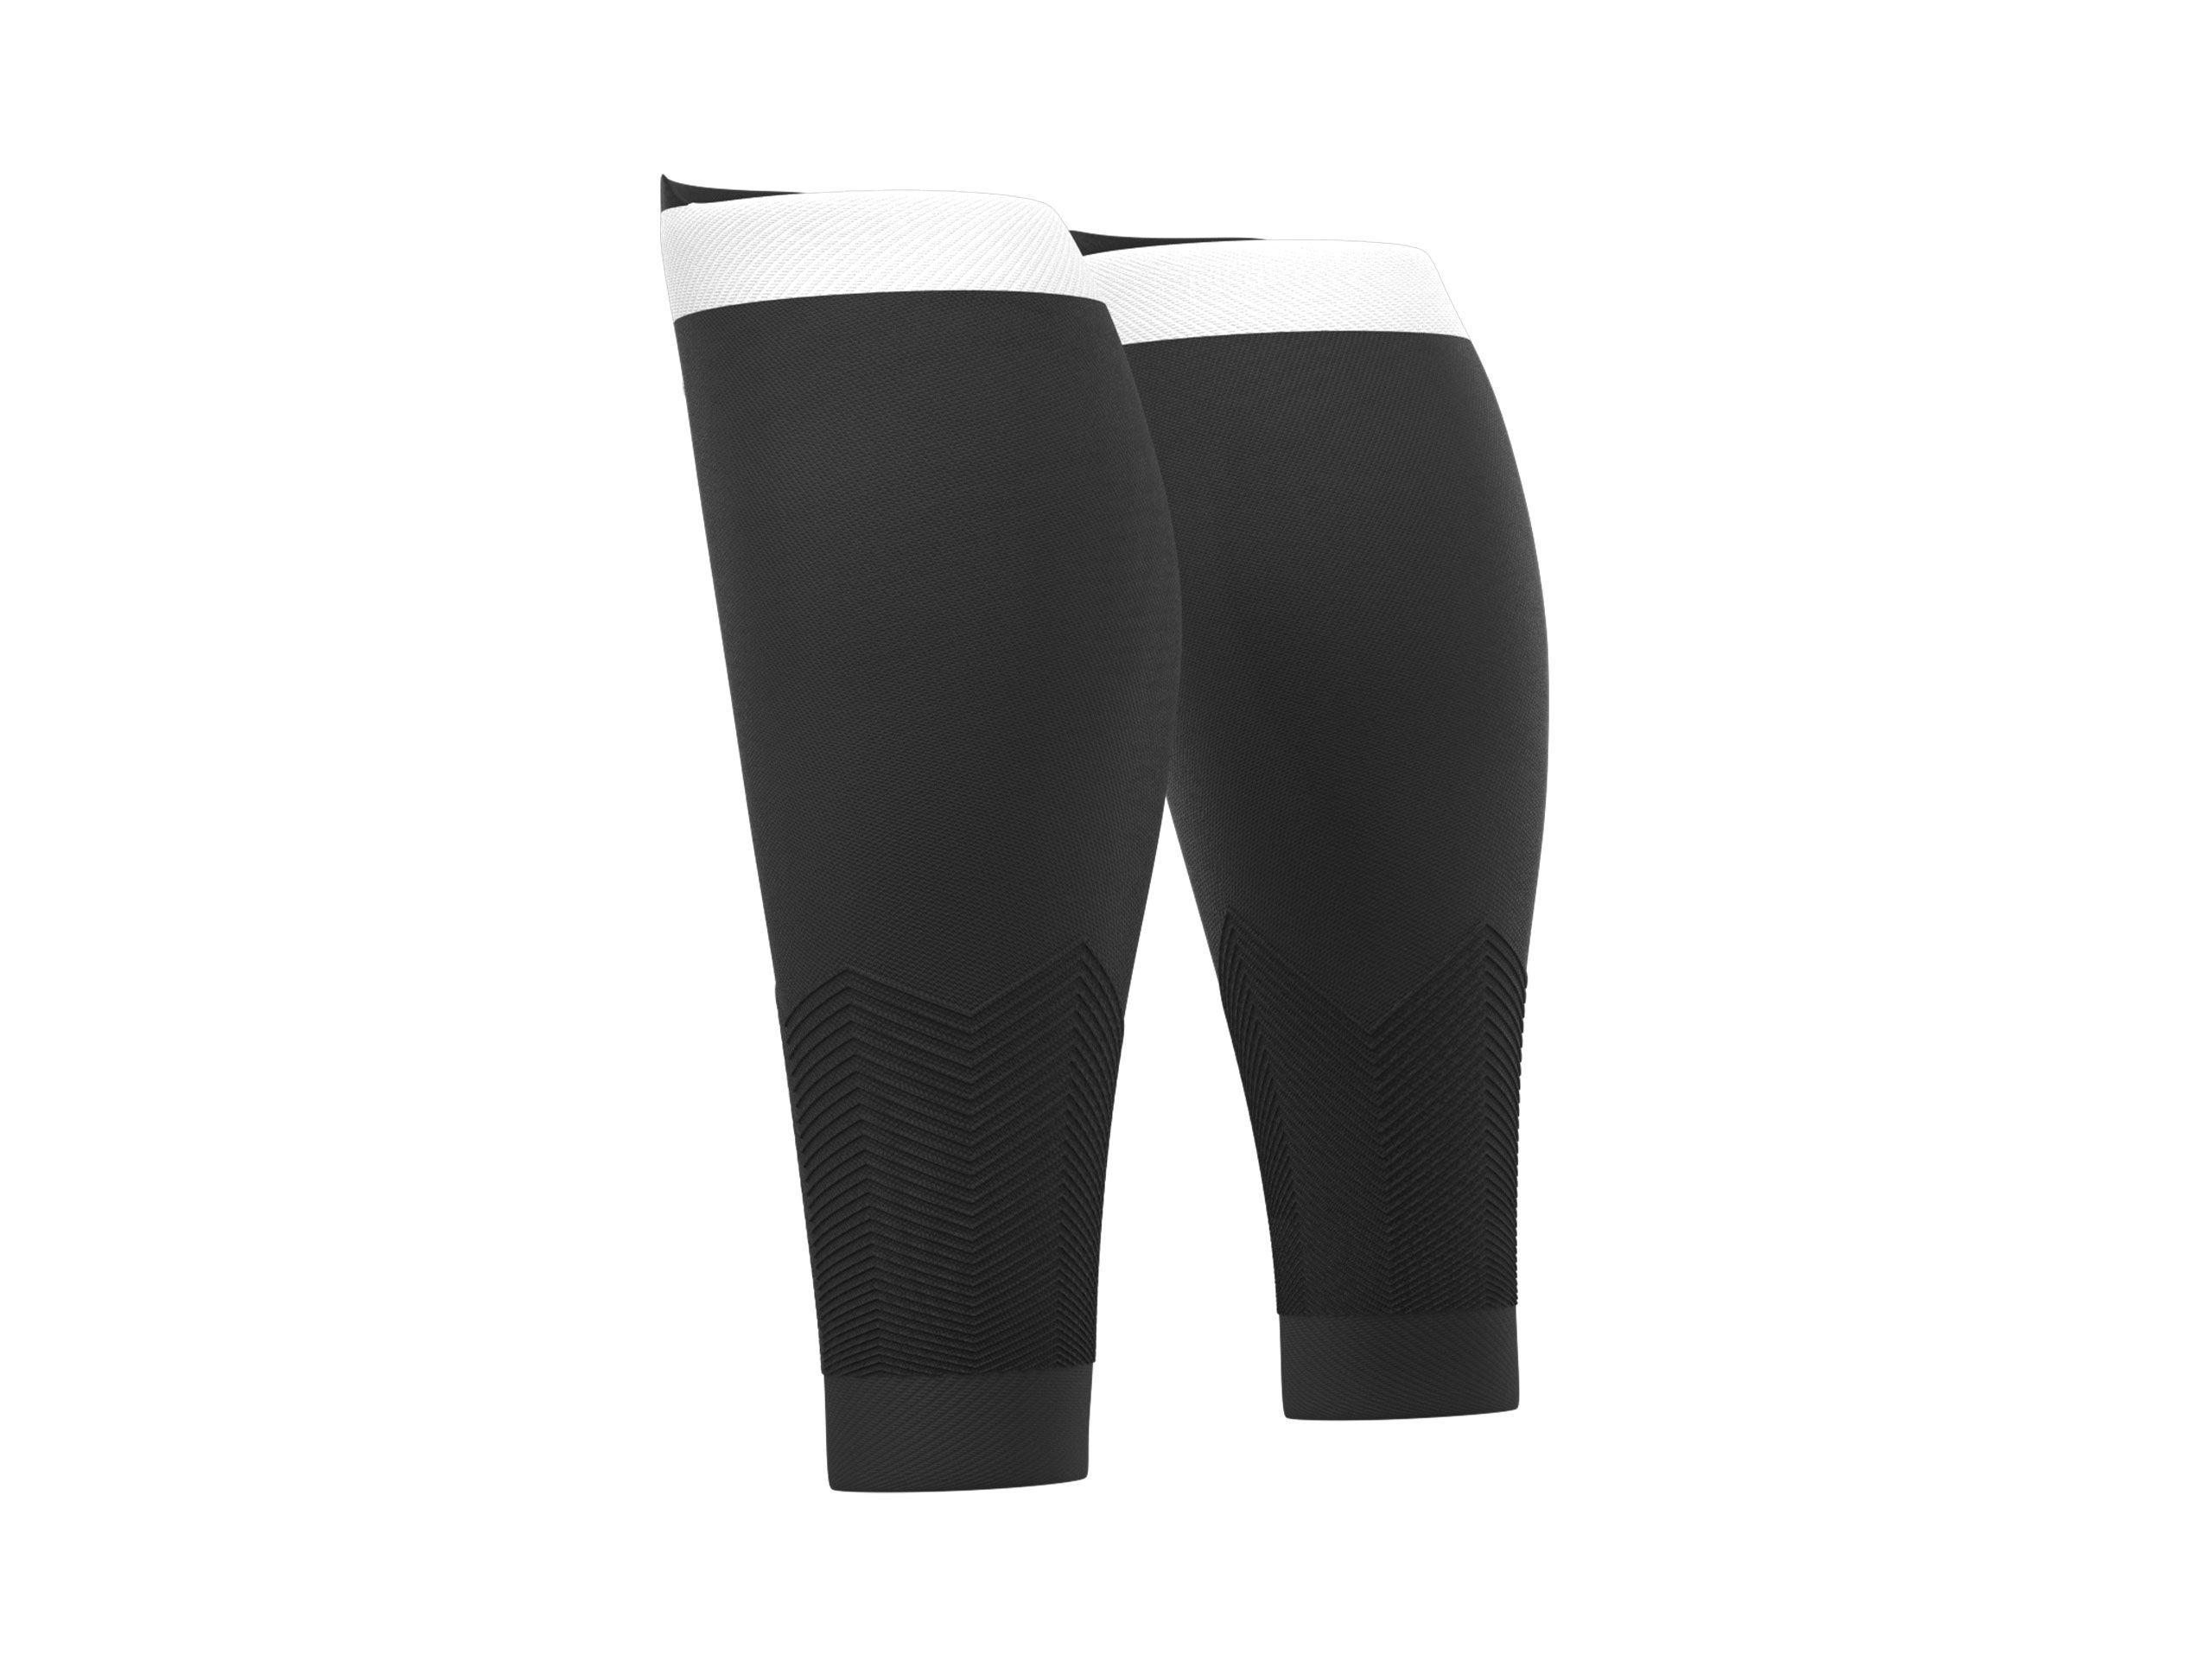 R2v2 calf sleeves black